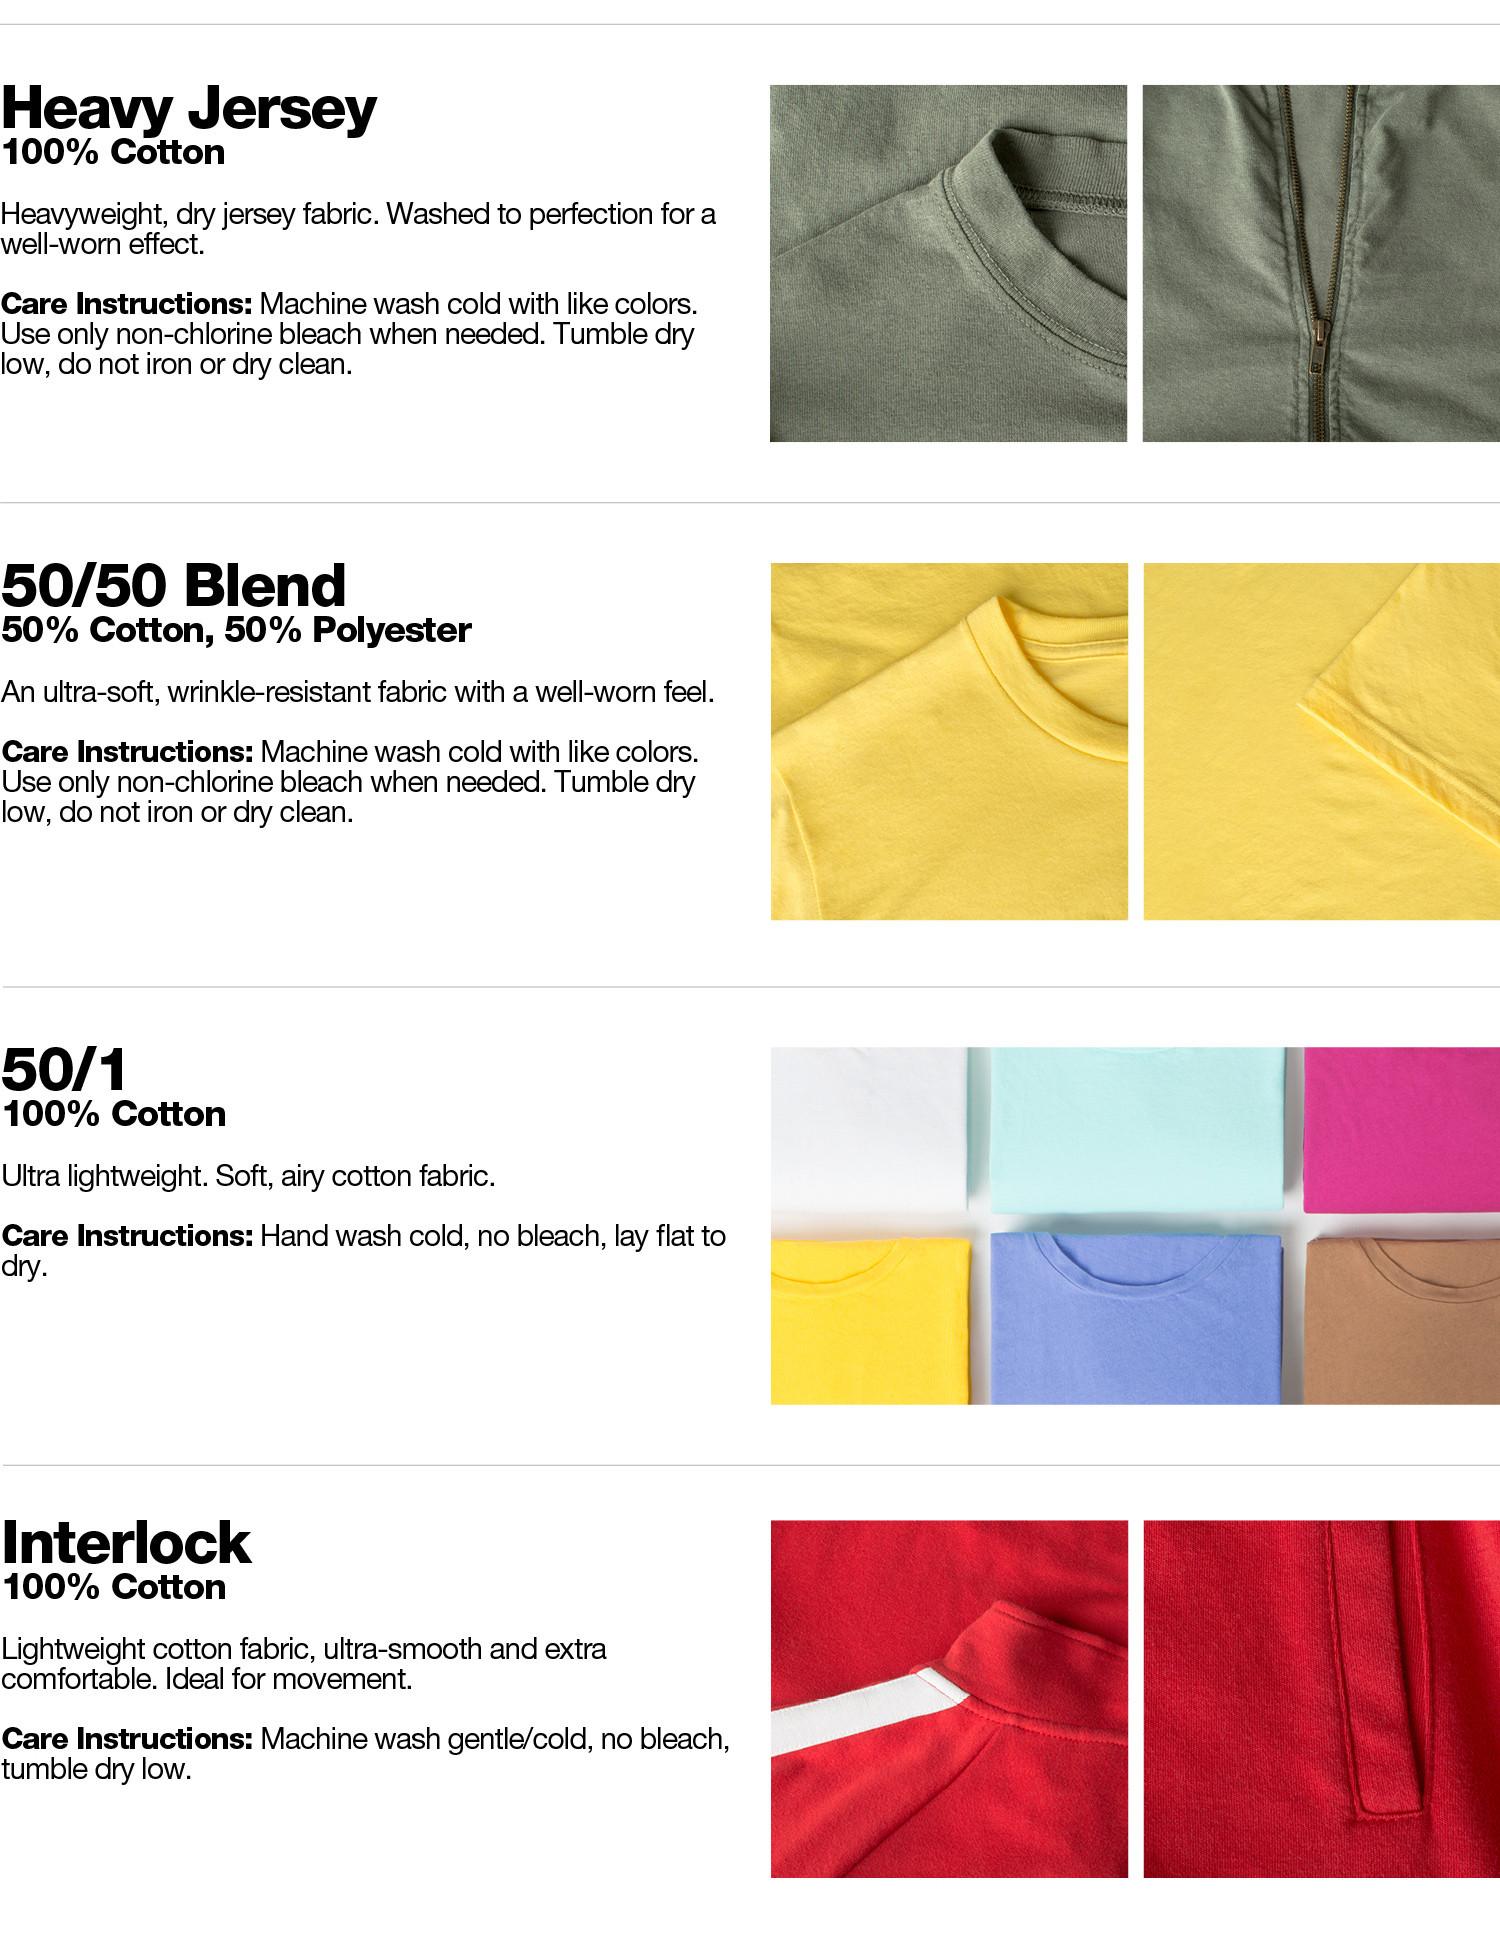 Meet the Fabrics - 3